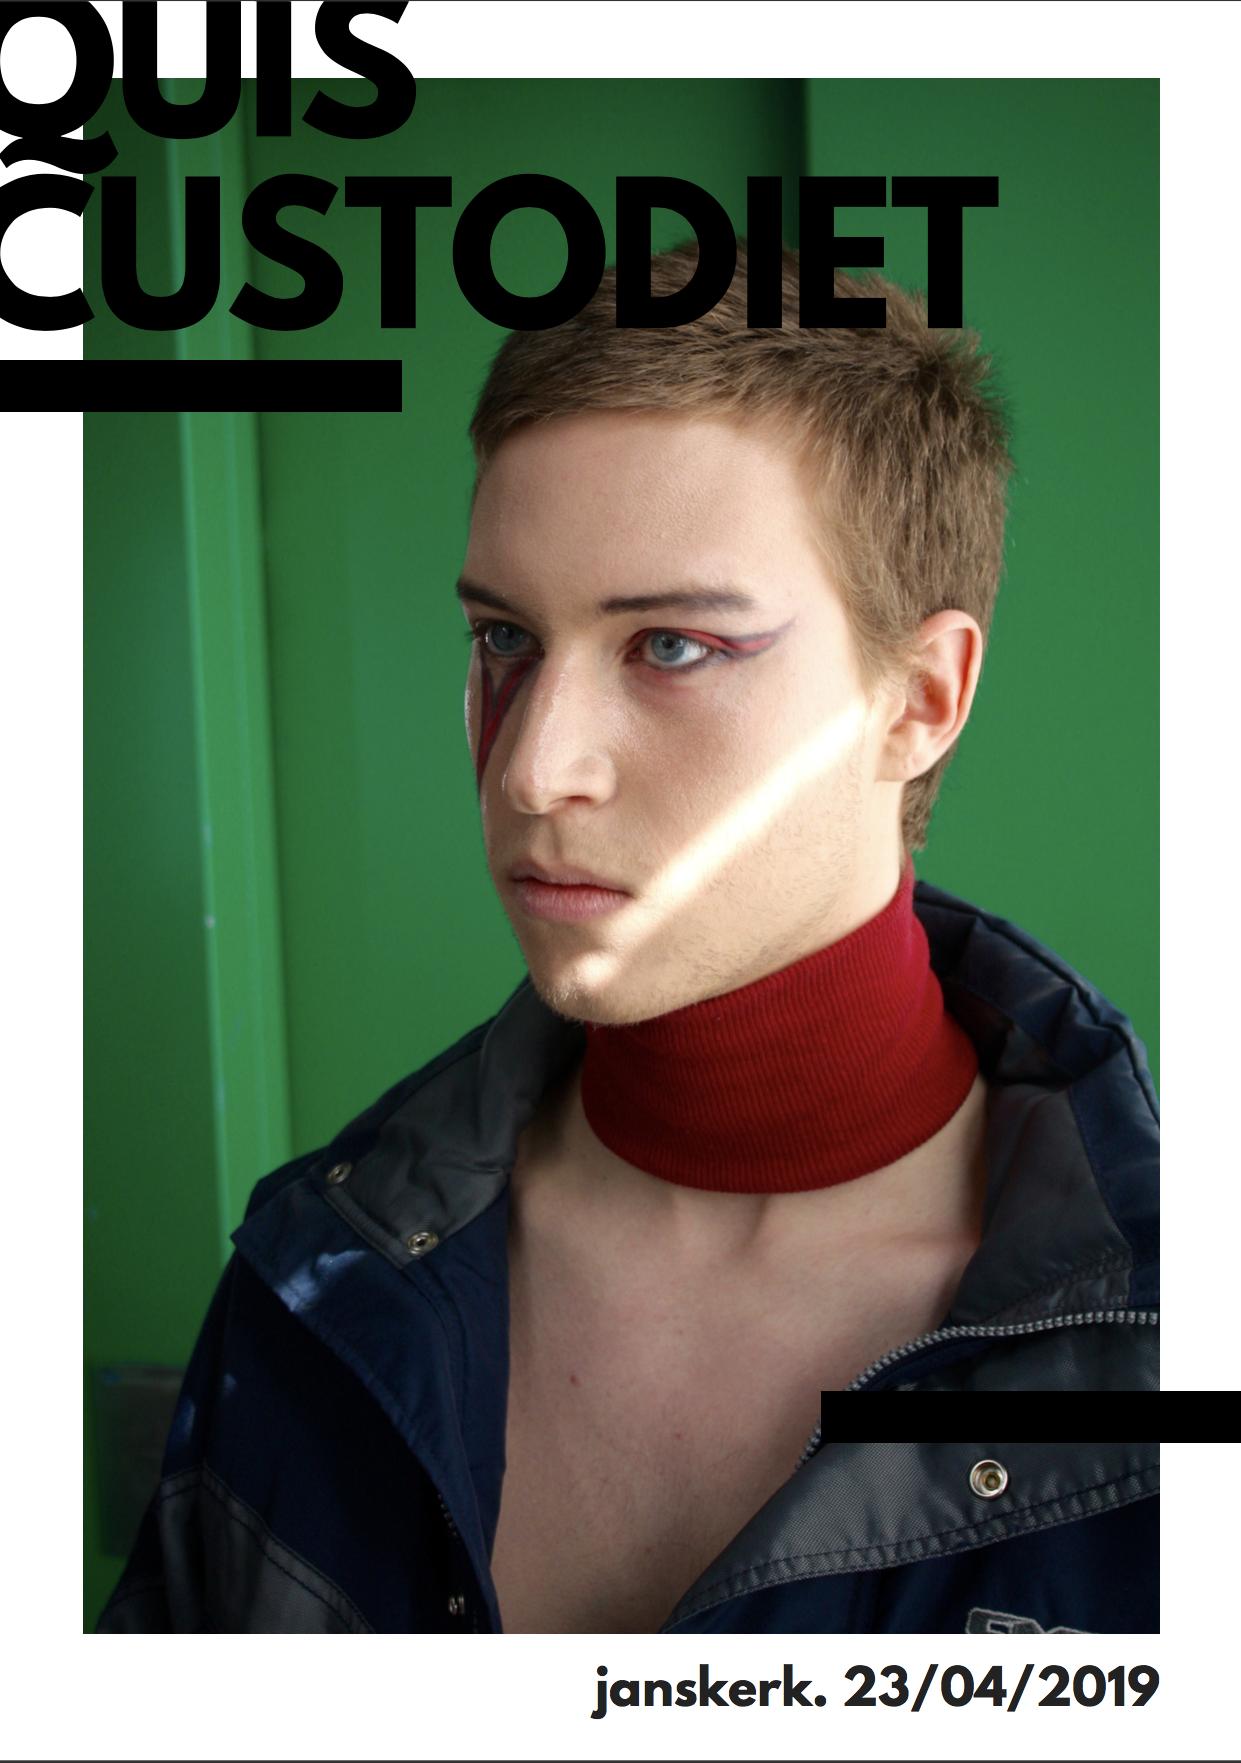 Quis Custodiet: UCU Fashion Show 2019